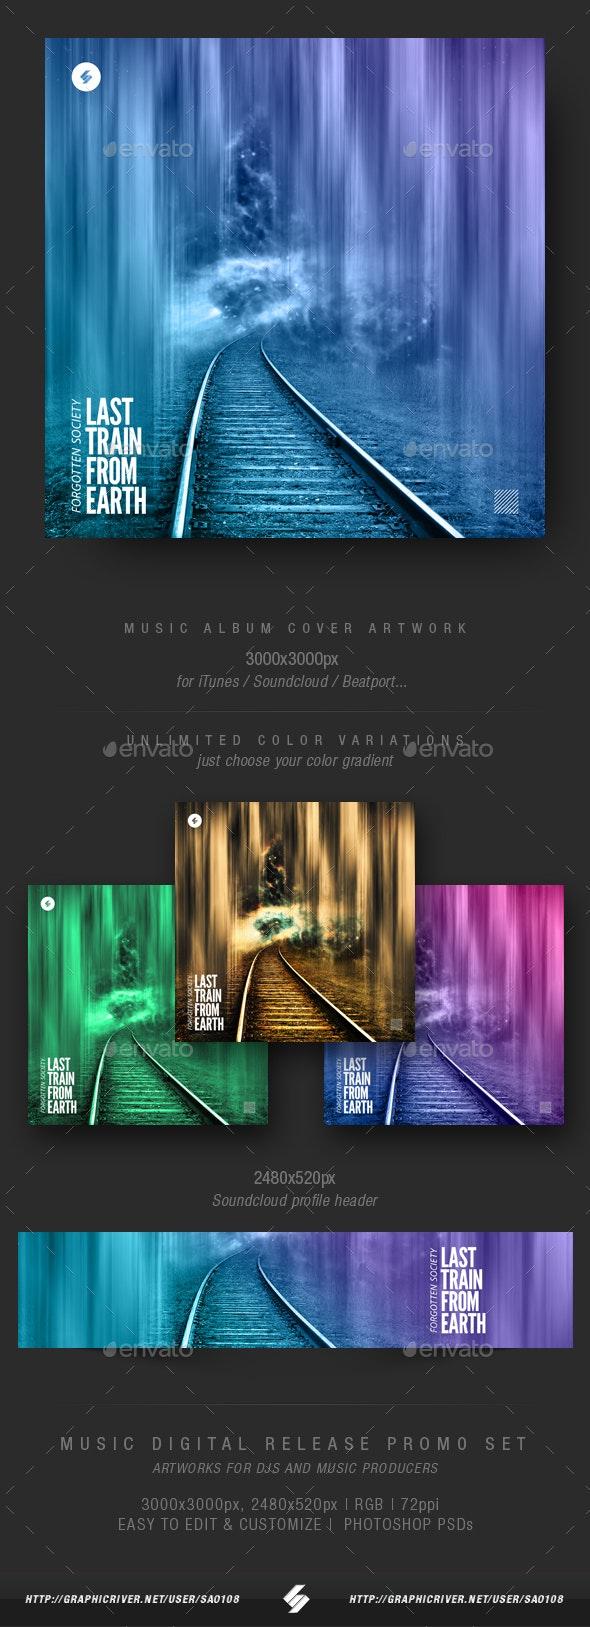 Last Train From Earth - Music Album Cover Artwork Template - Miscellaneous Social Media